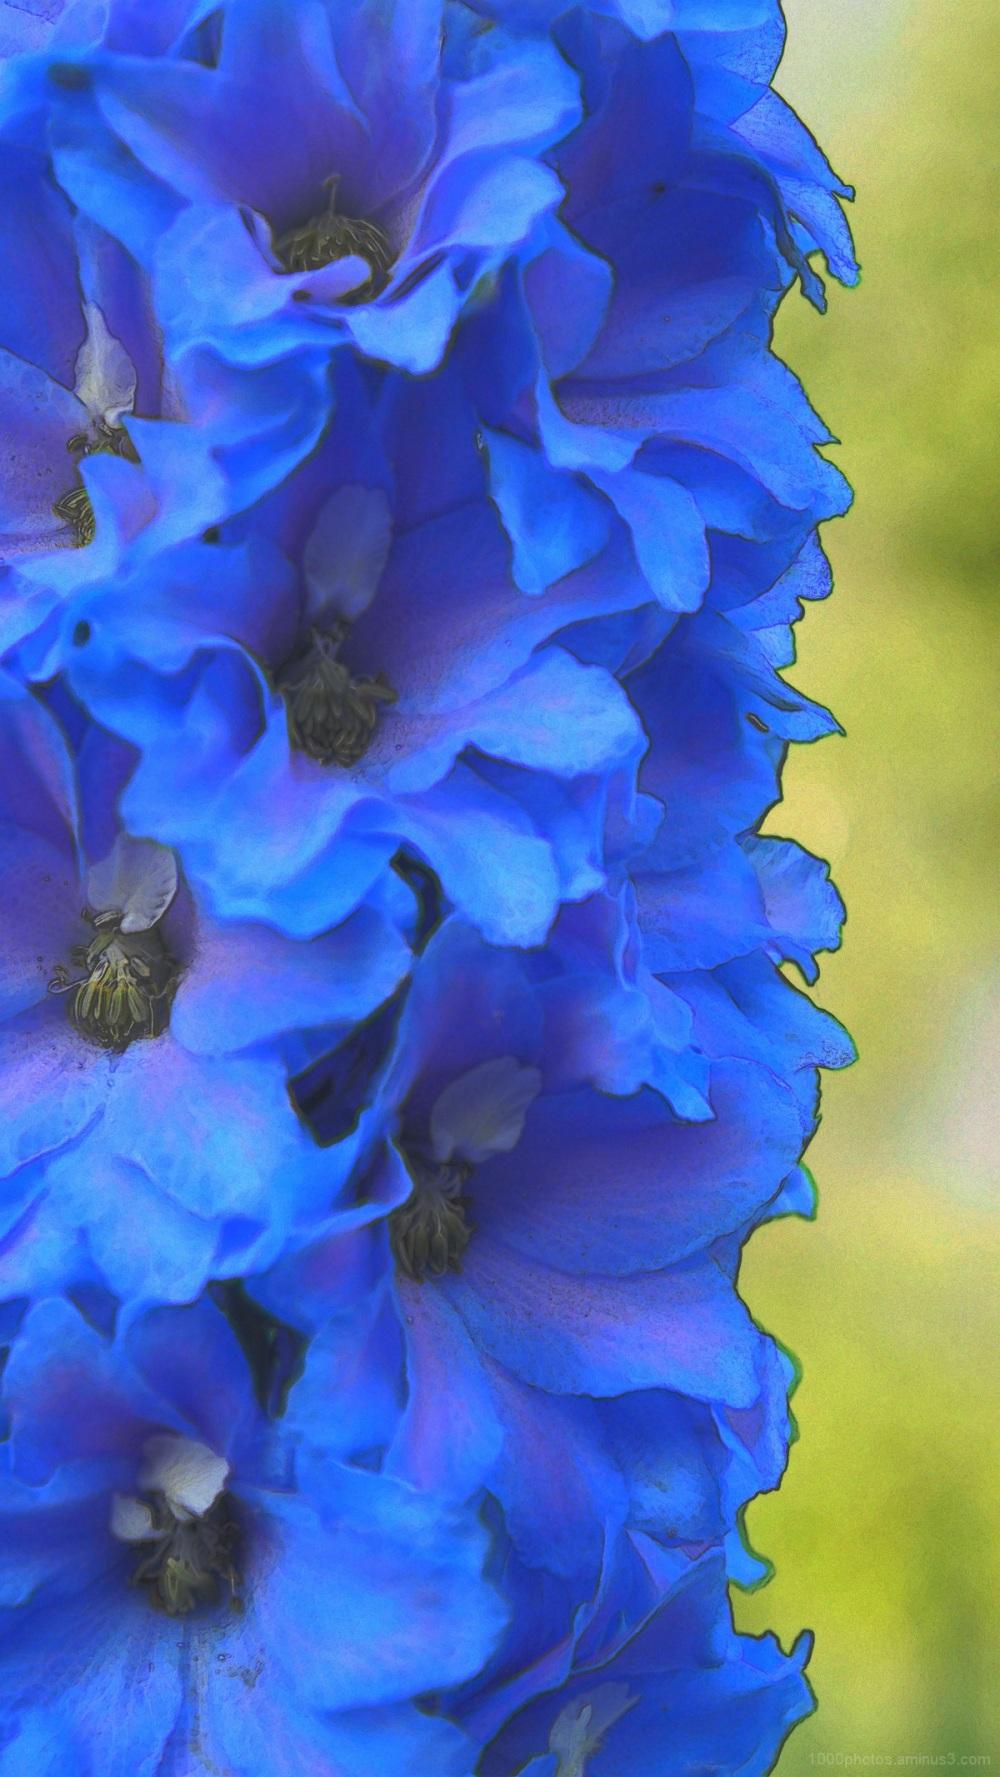 Bleu céruléum